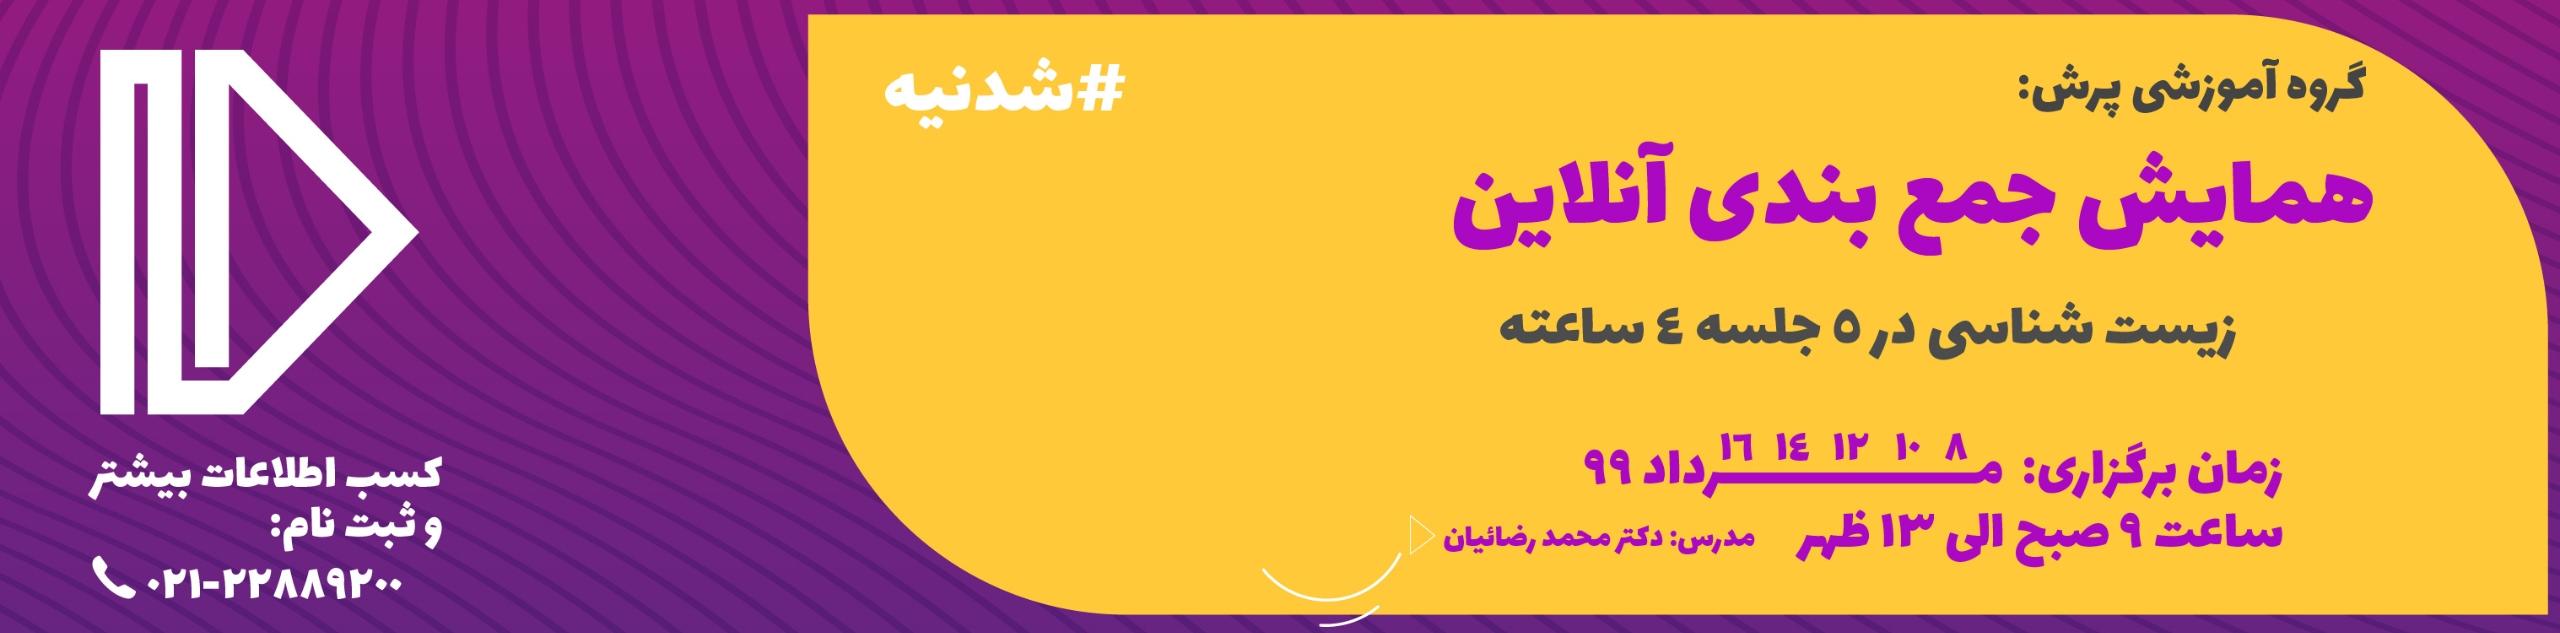 (@soheilramezani) Cover Image